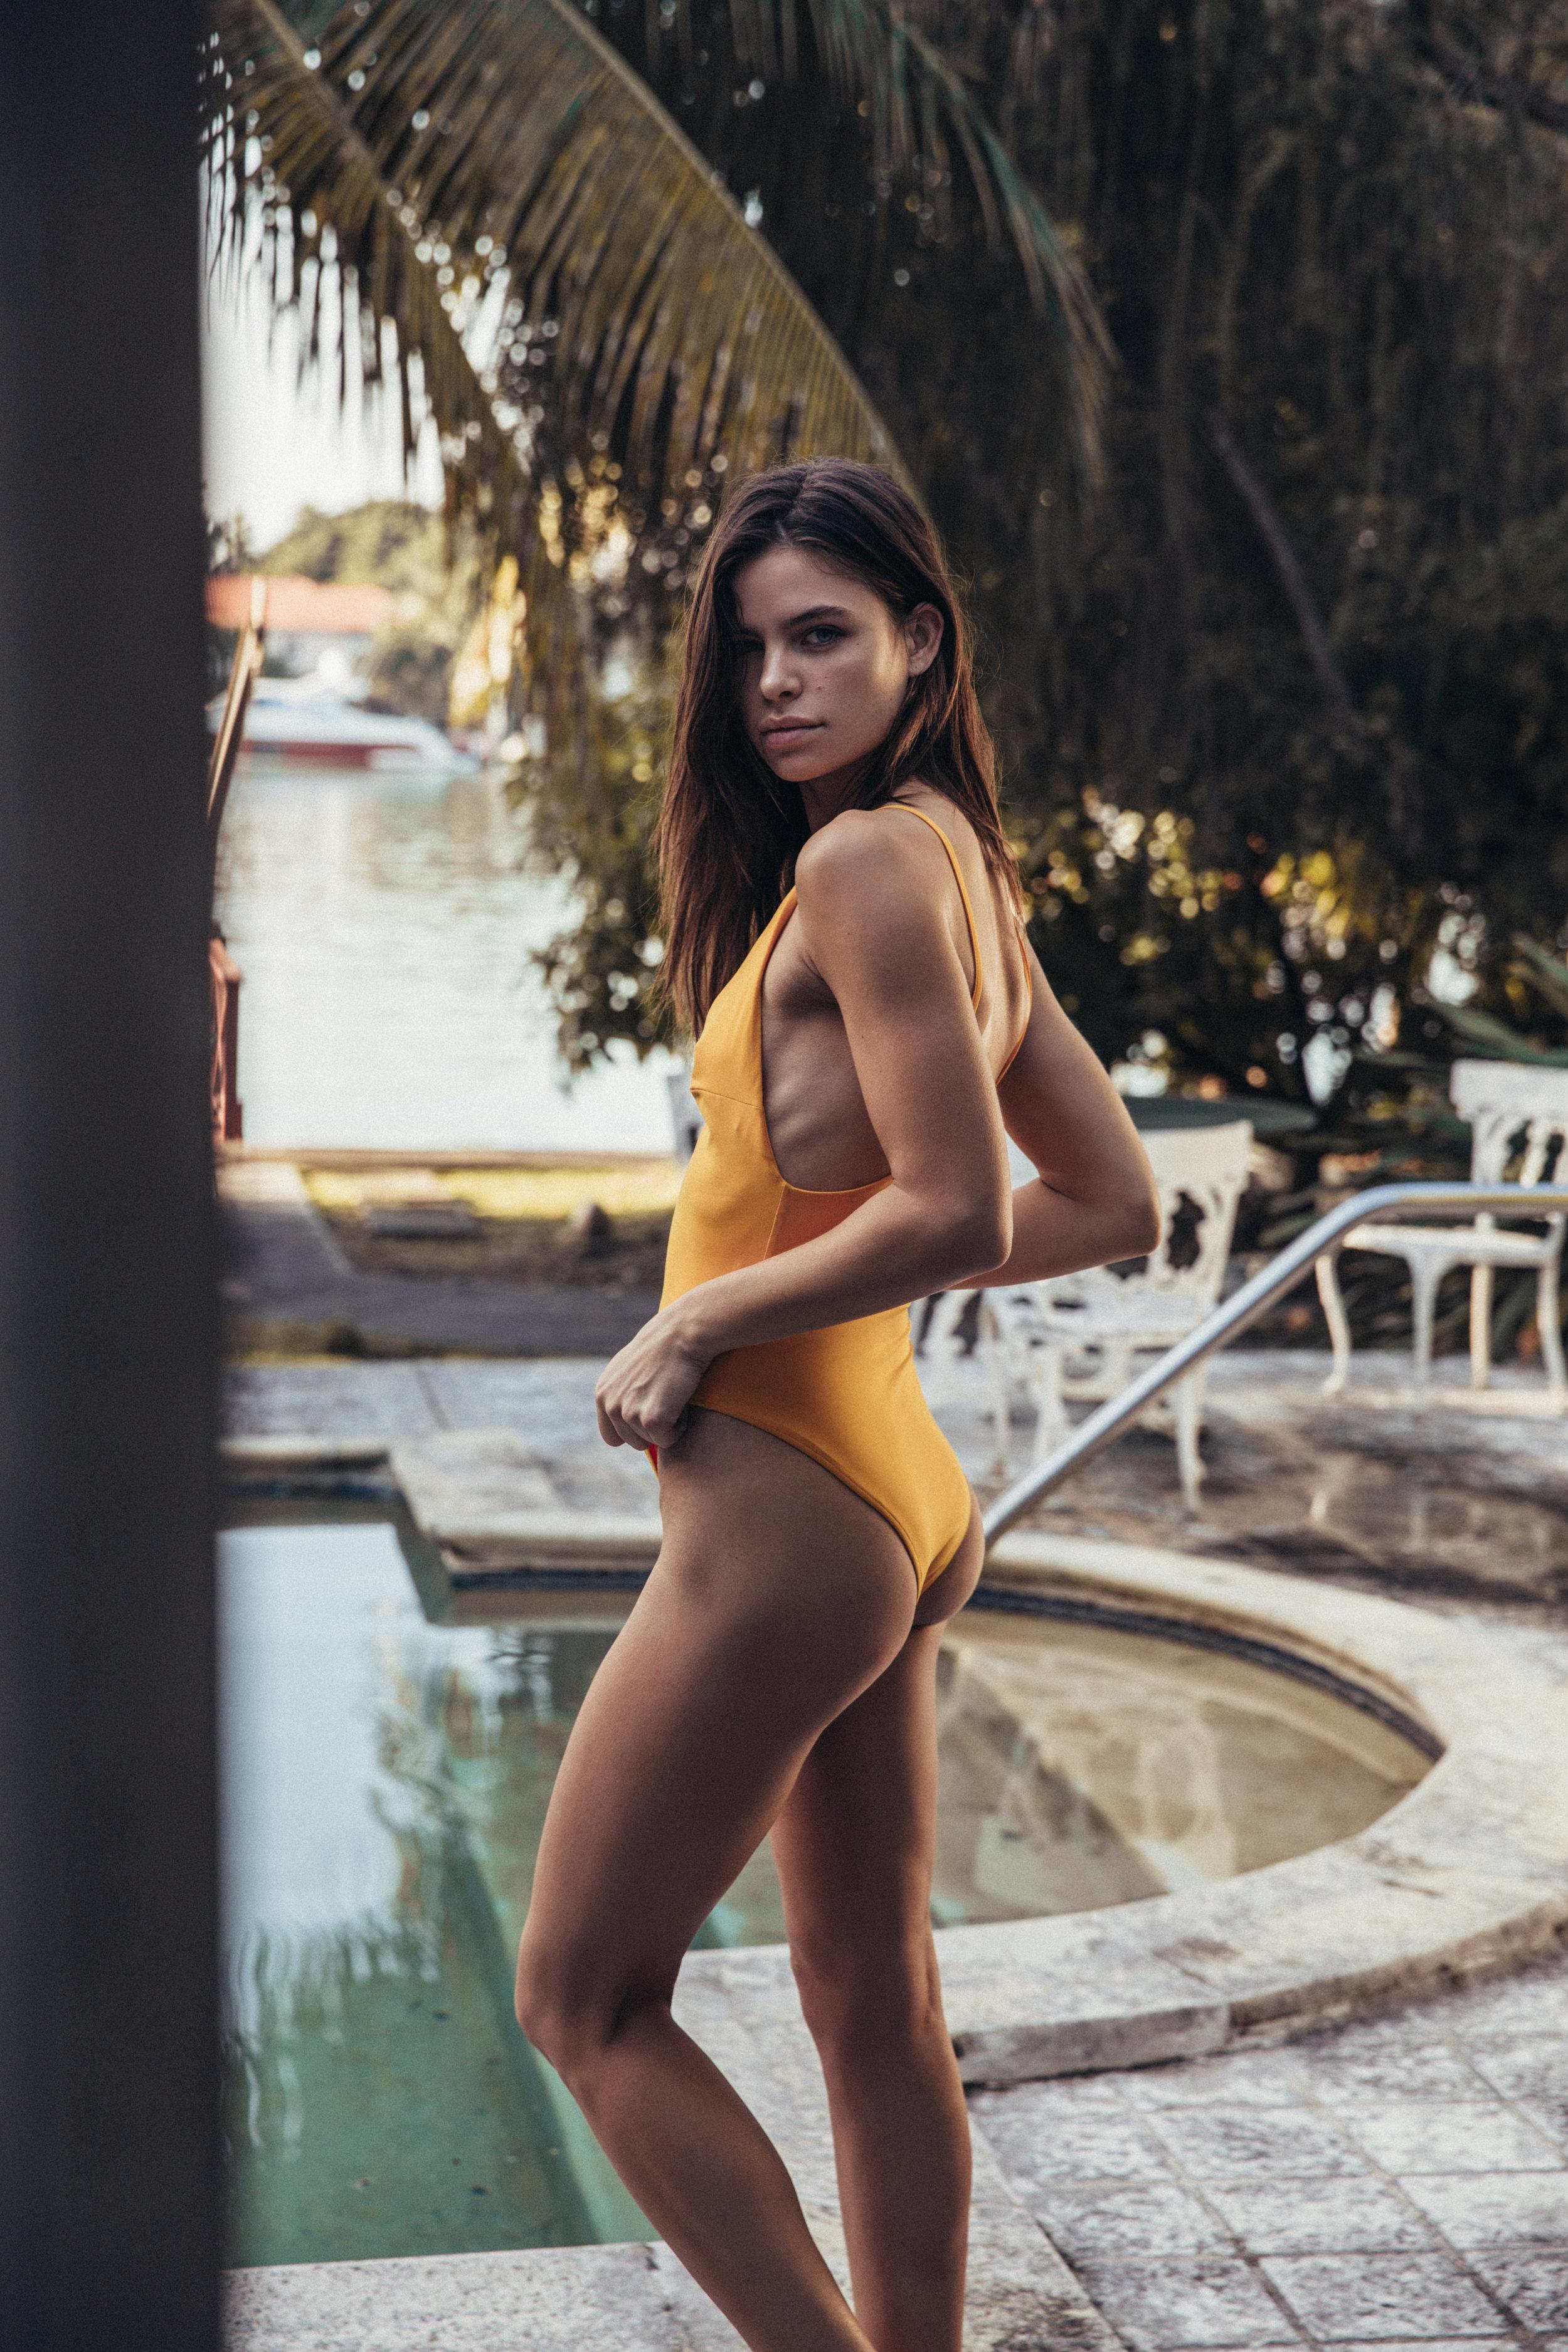 becca lane model airbrush spray tan swimwear photoshoot editorial vogue